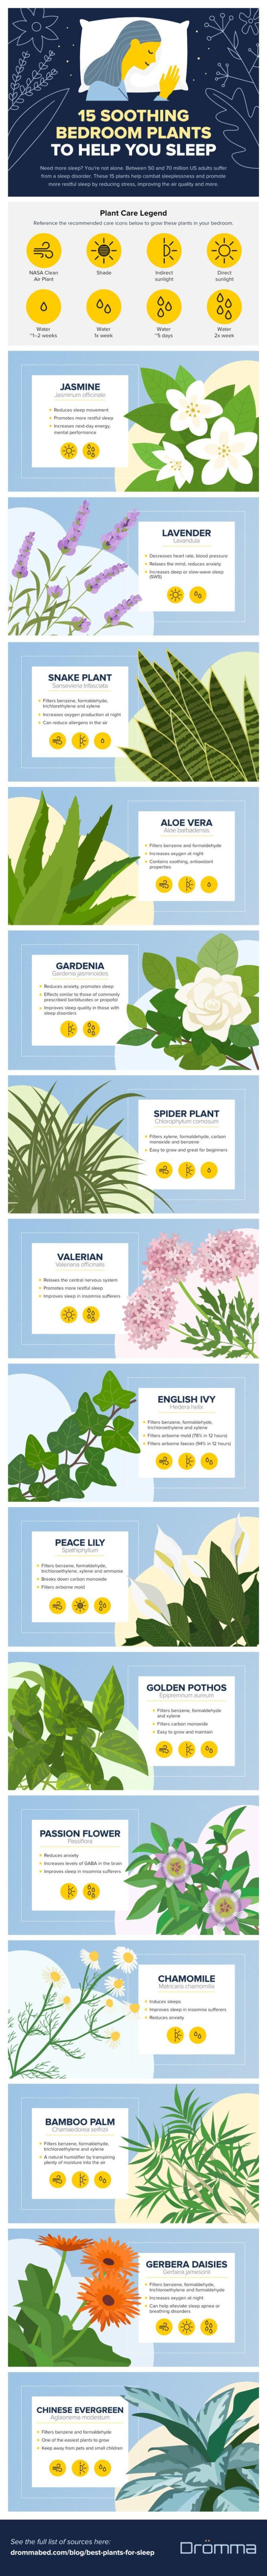 Infographic: 5 Soothing Bedroom Plants to Help You Sleep